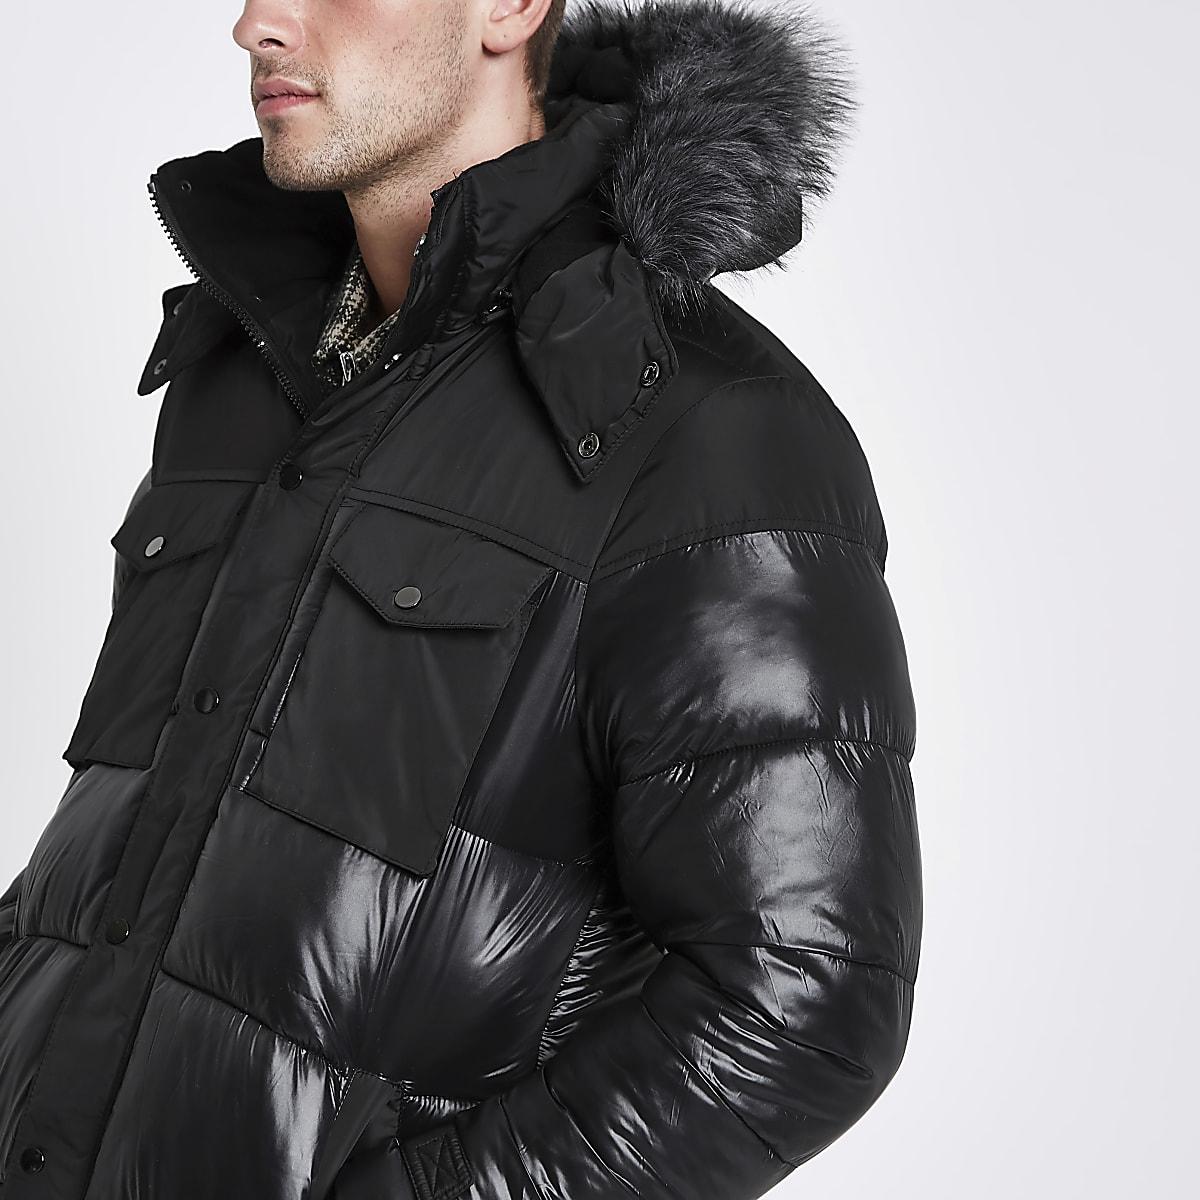 ff66d6c43 Black faux fur trim hooded long puffer jacket